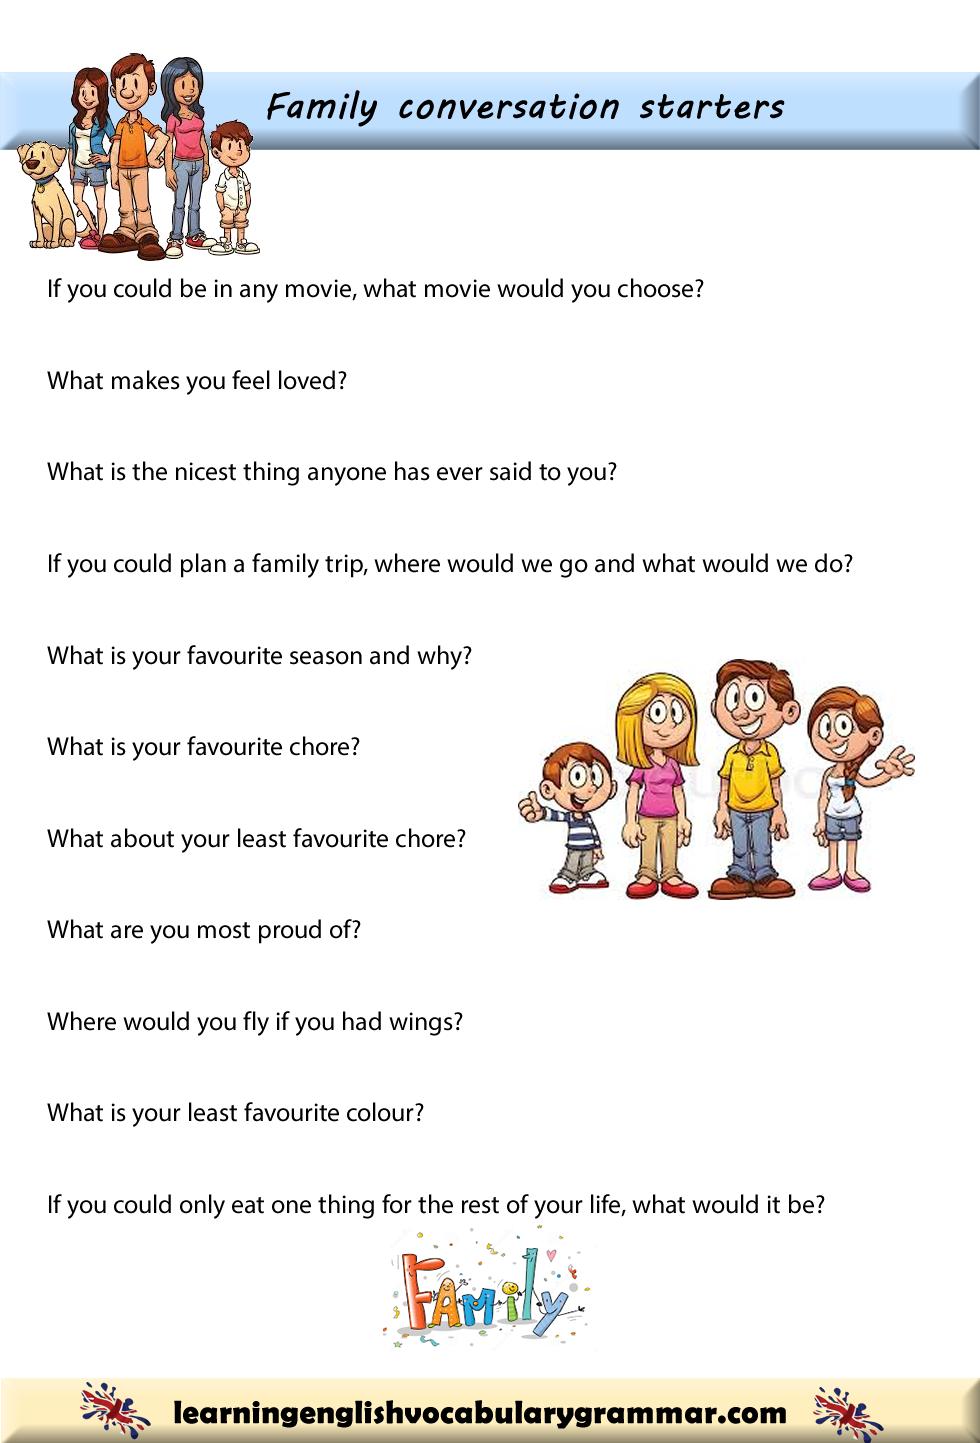 Conversation starters for family gatherings | Ingilizce